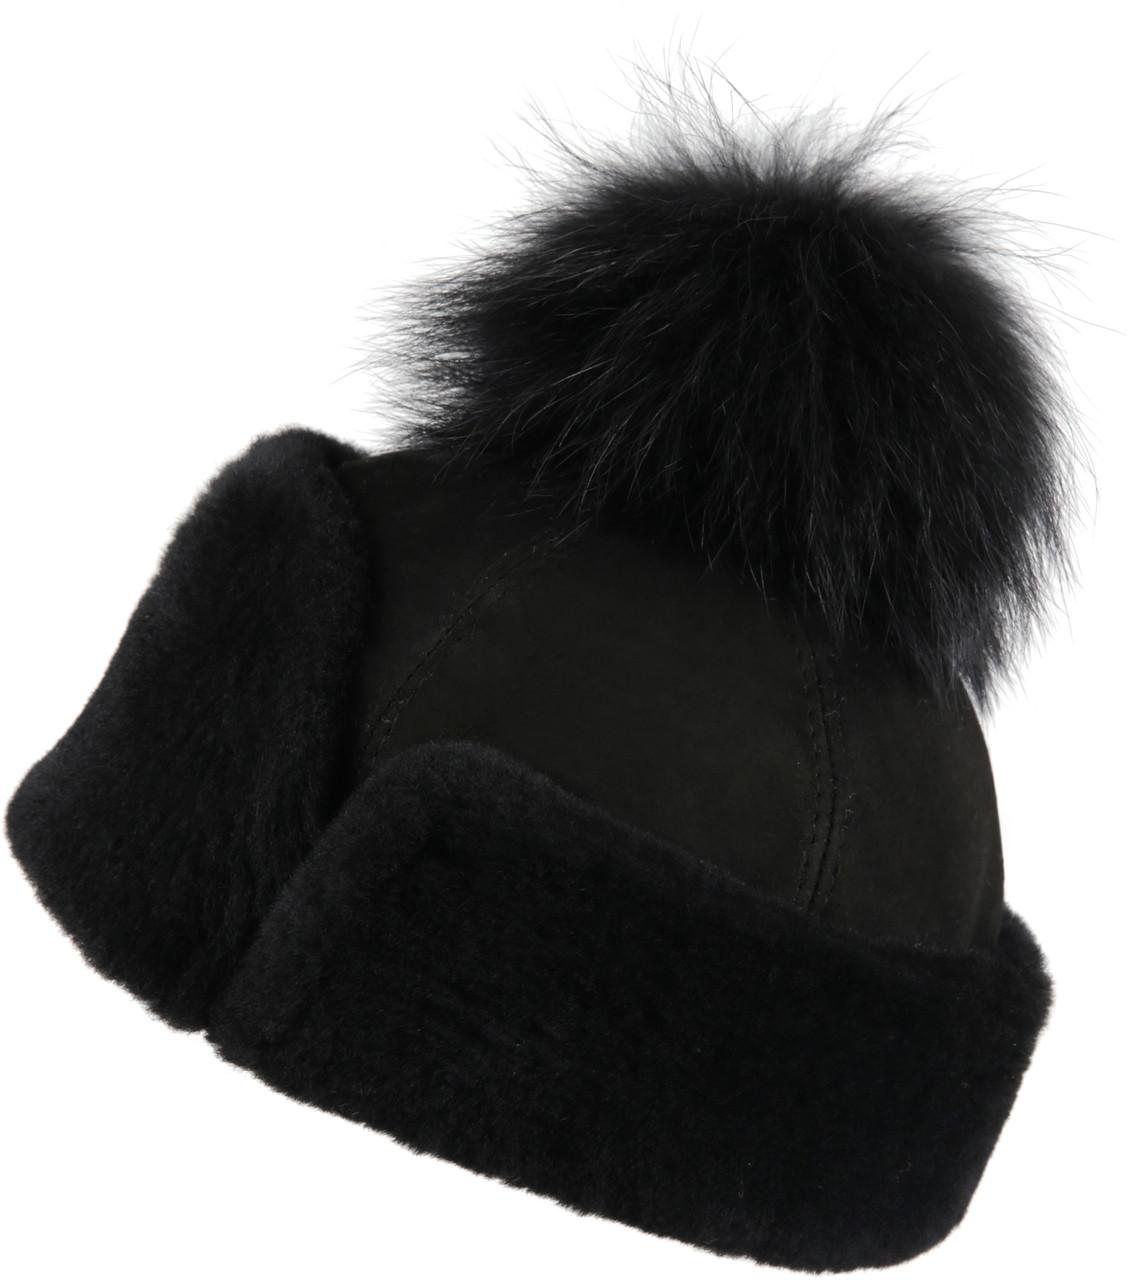 8a5ff17105e755 ... Women's Shearling Sheepskin Snap Hat with Fox Pom Pom Black Suede.  Image 1. Loading zoom